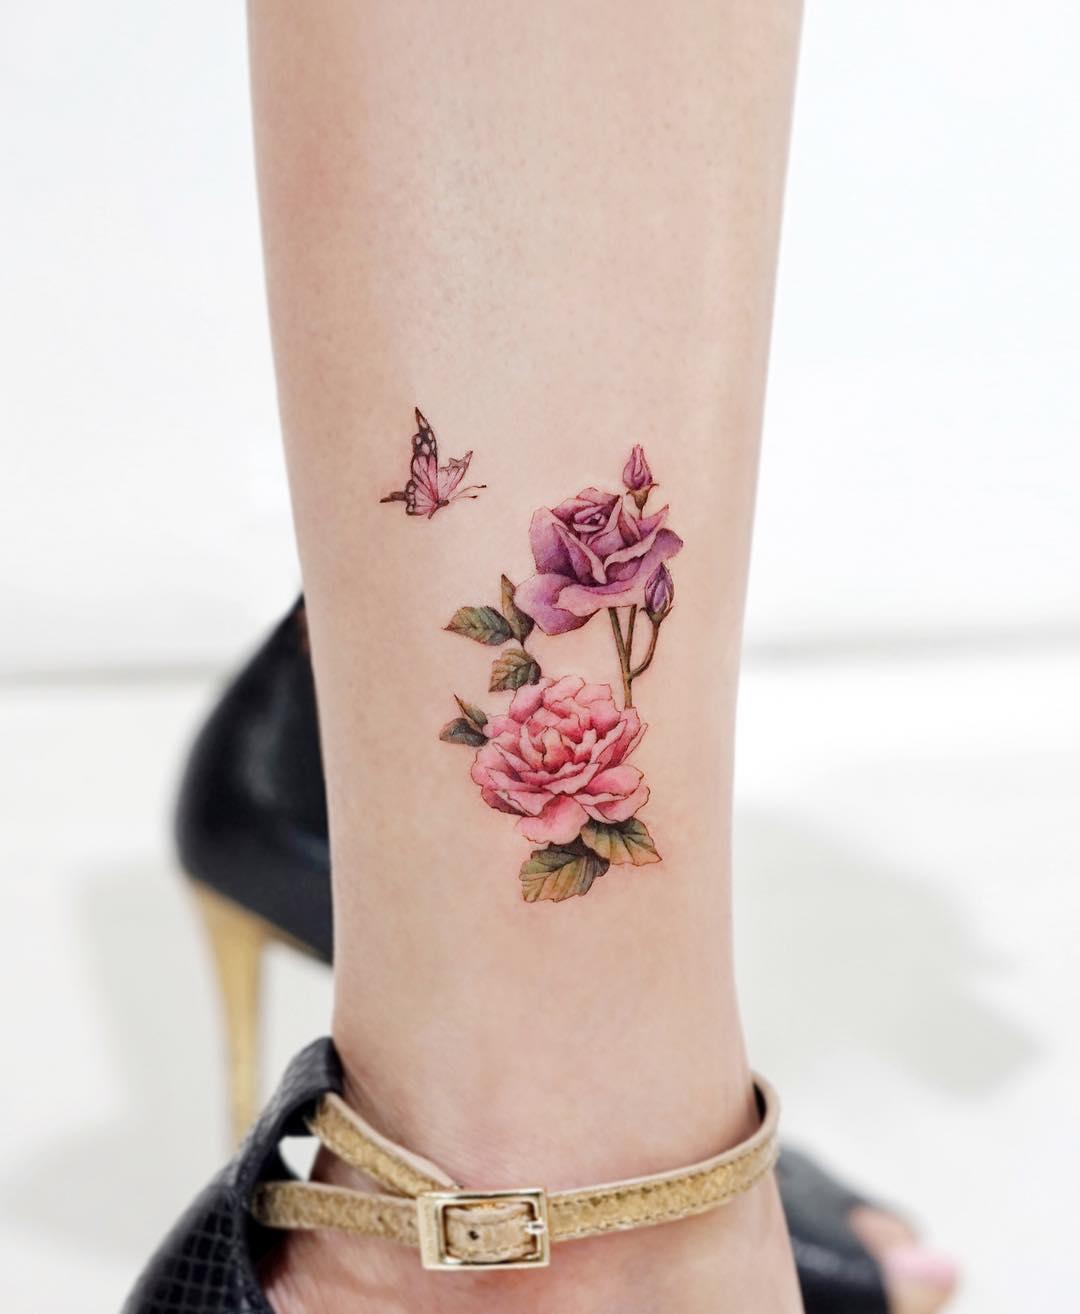 Roses by tattooist Ida